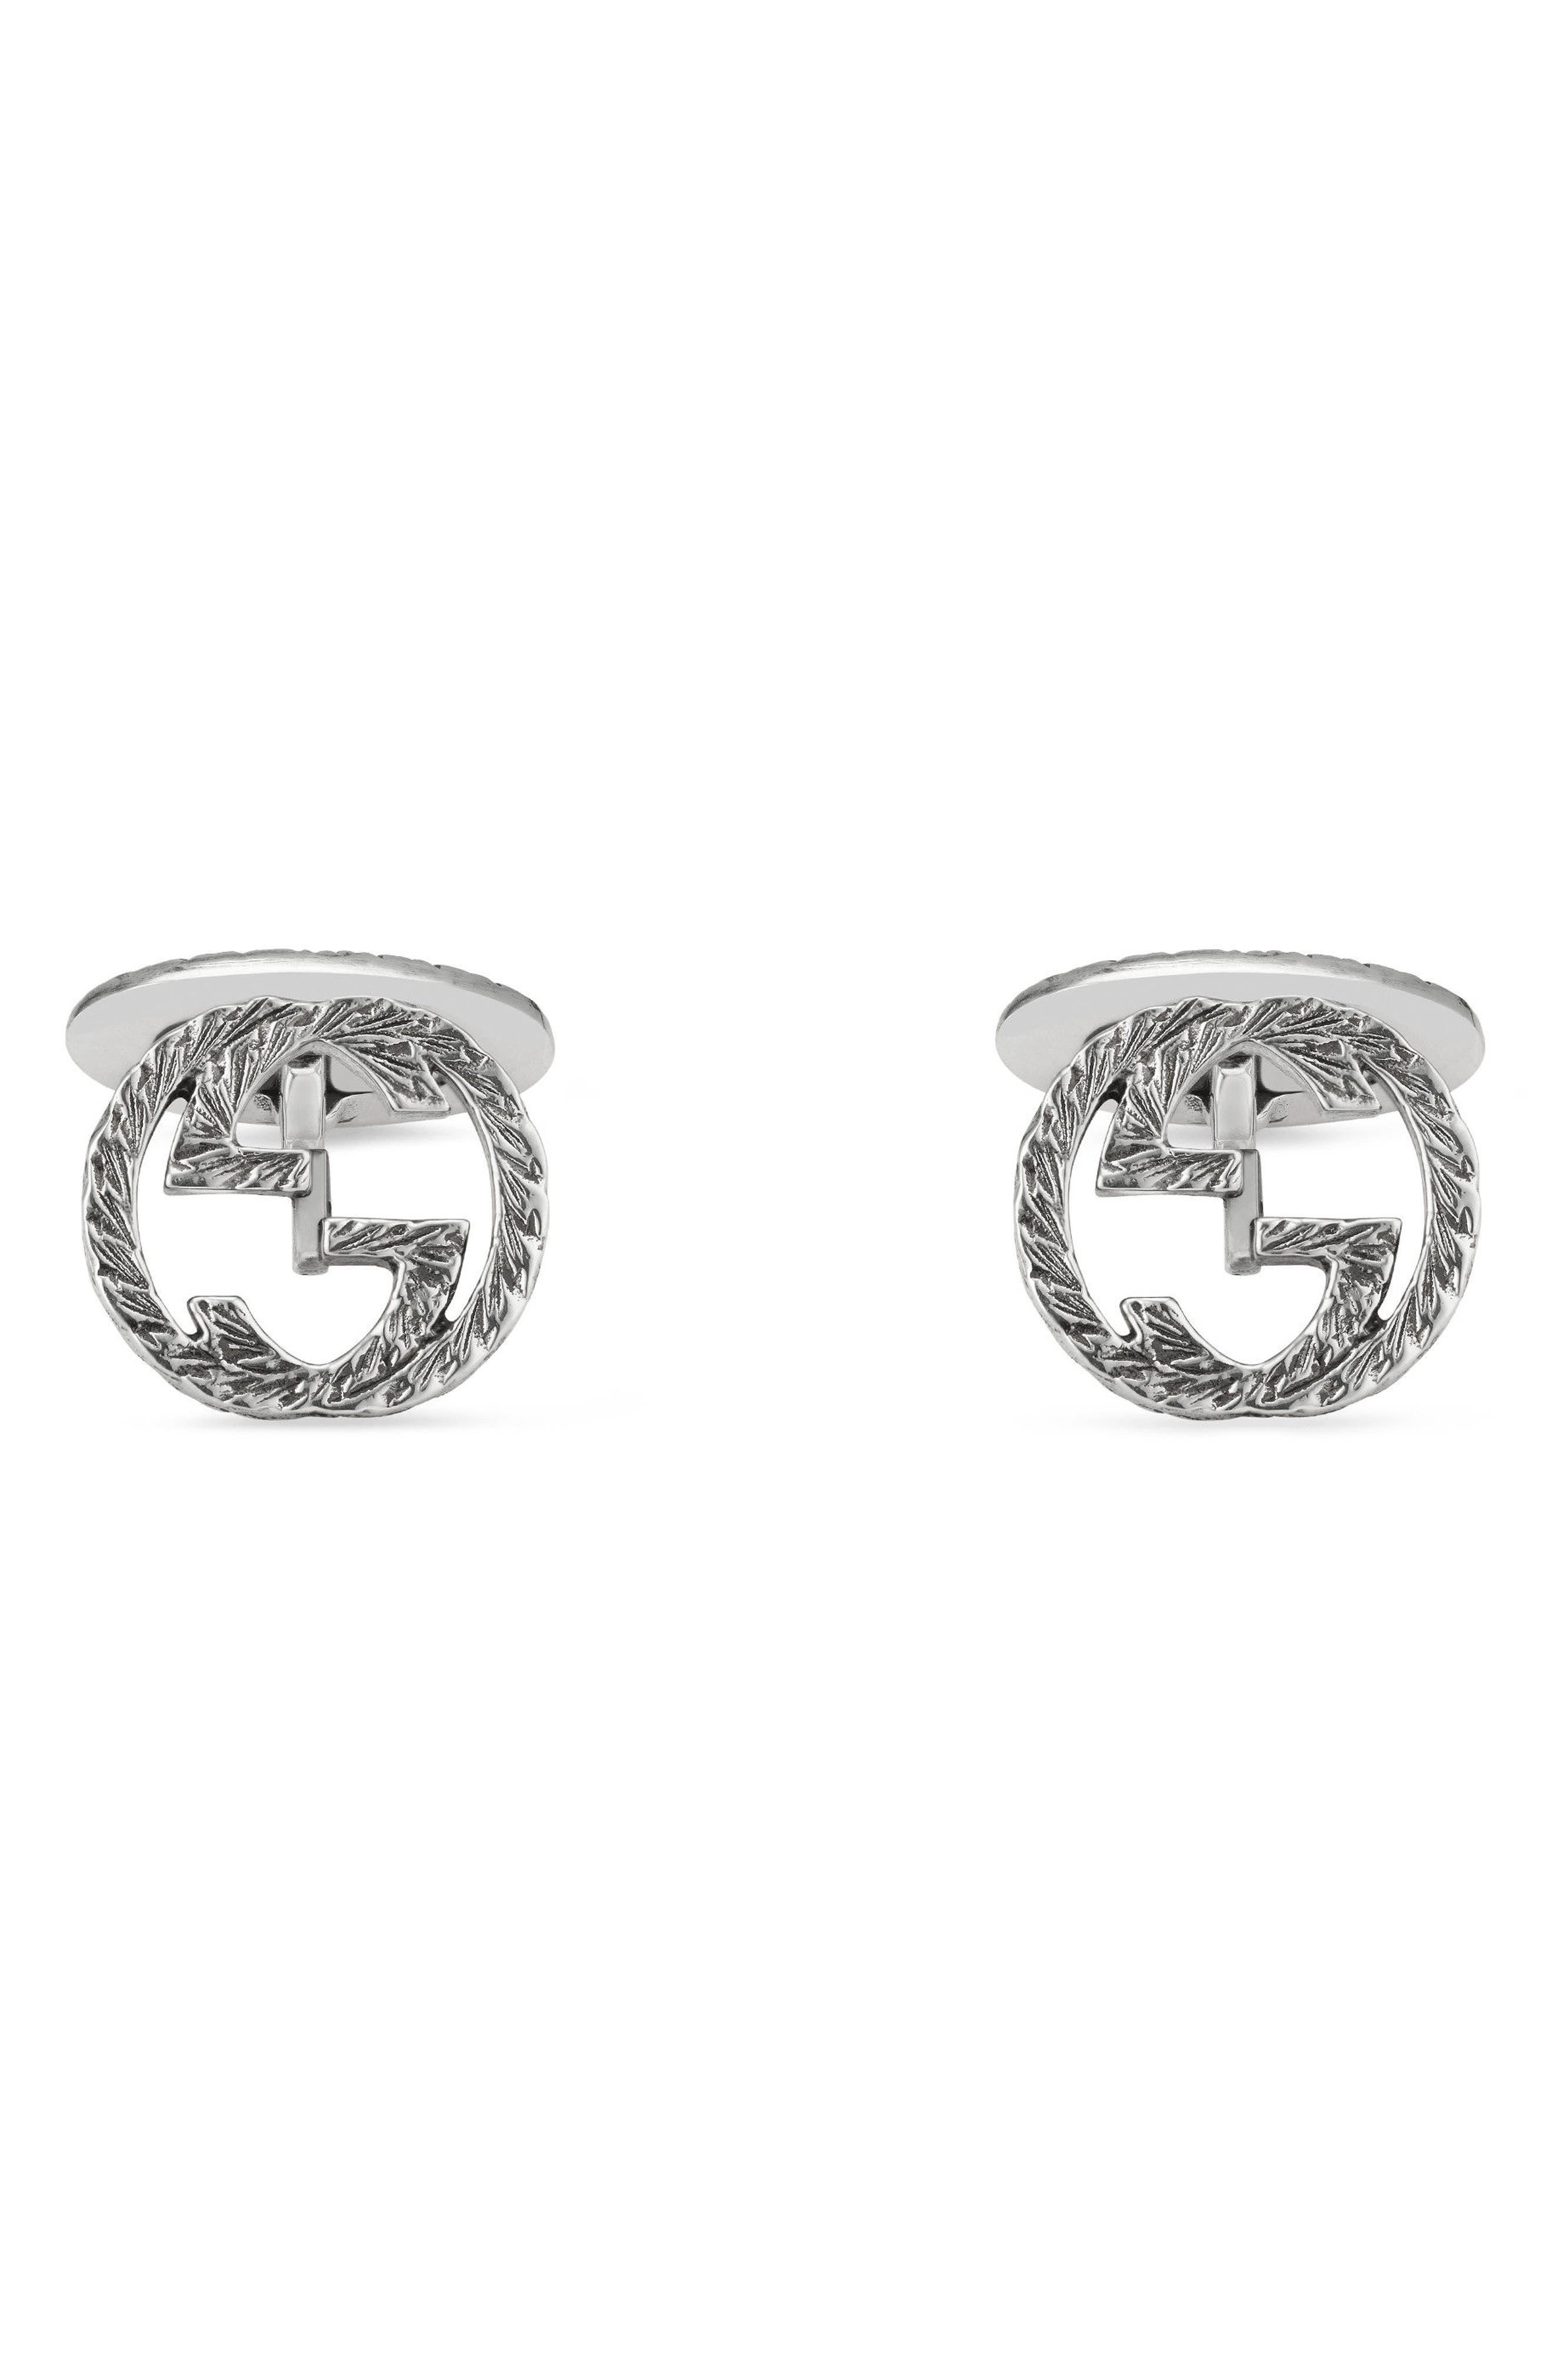 Alternate Image 1 Selected - Gucci Interlocking G Cuff Links